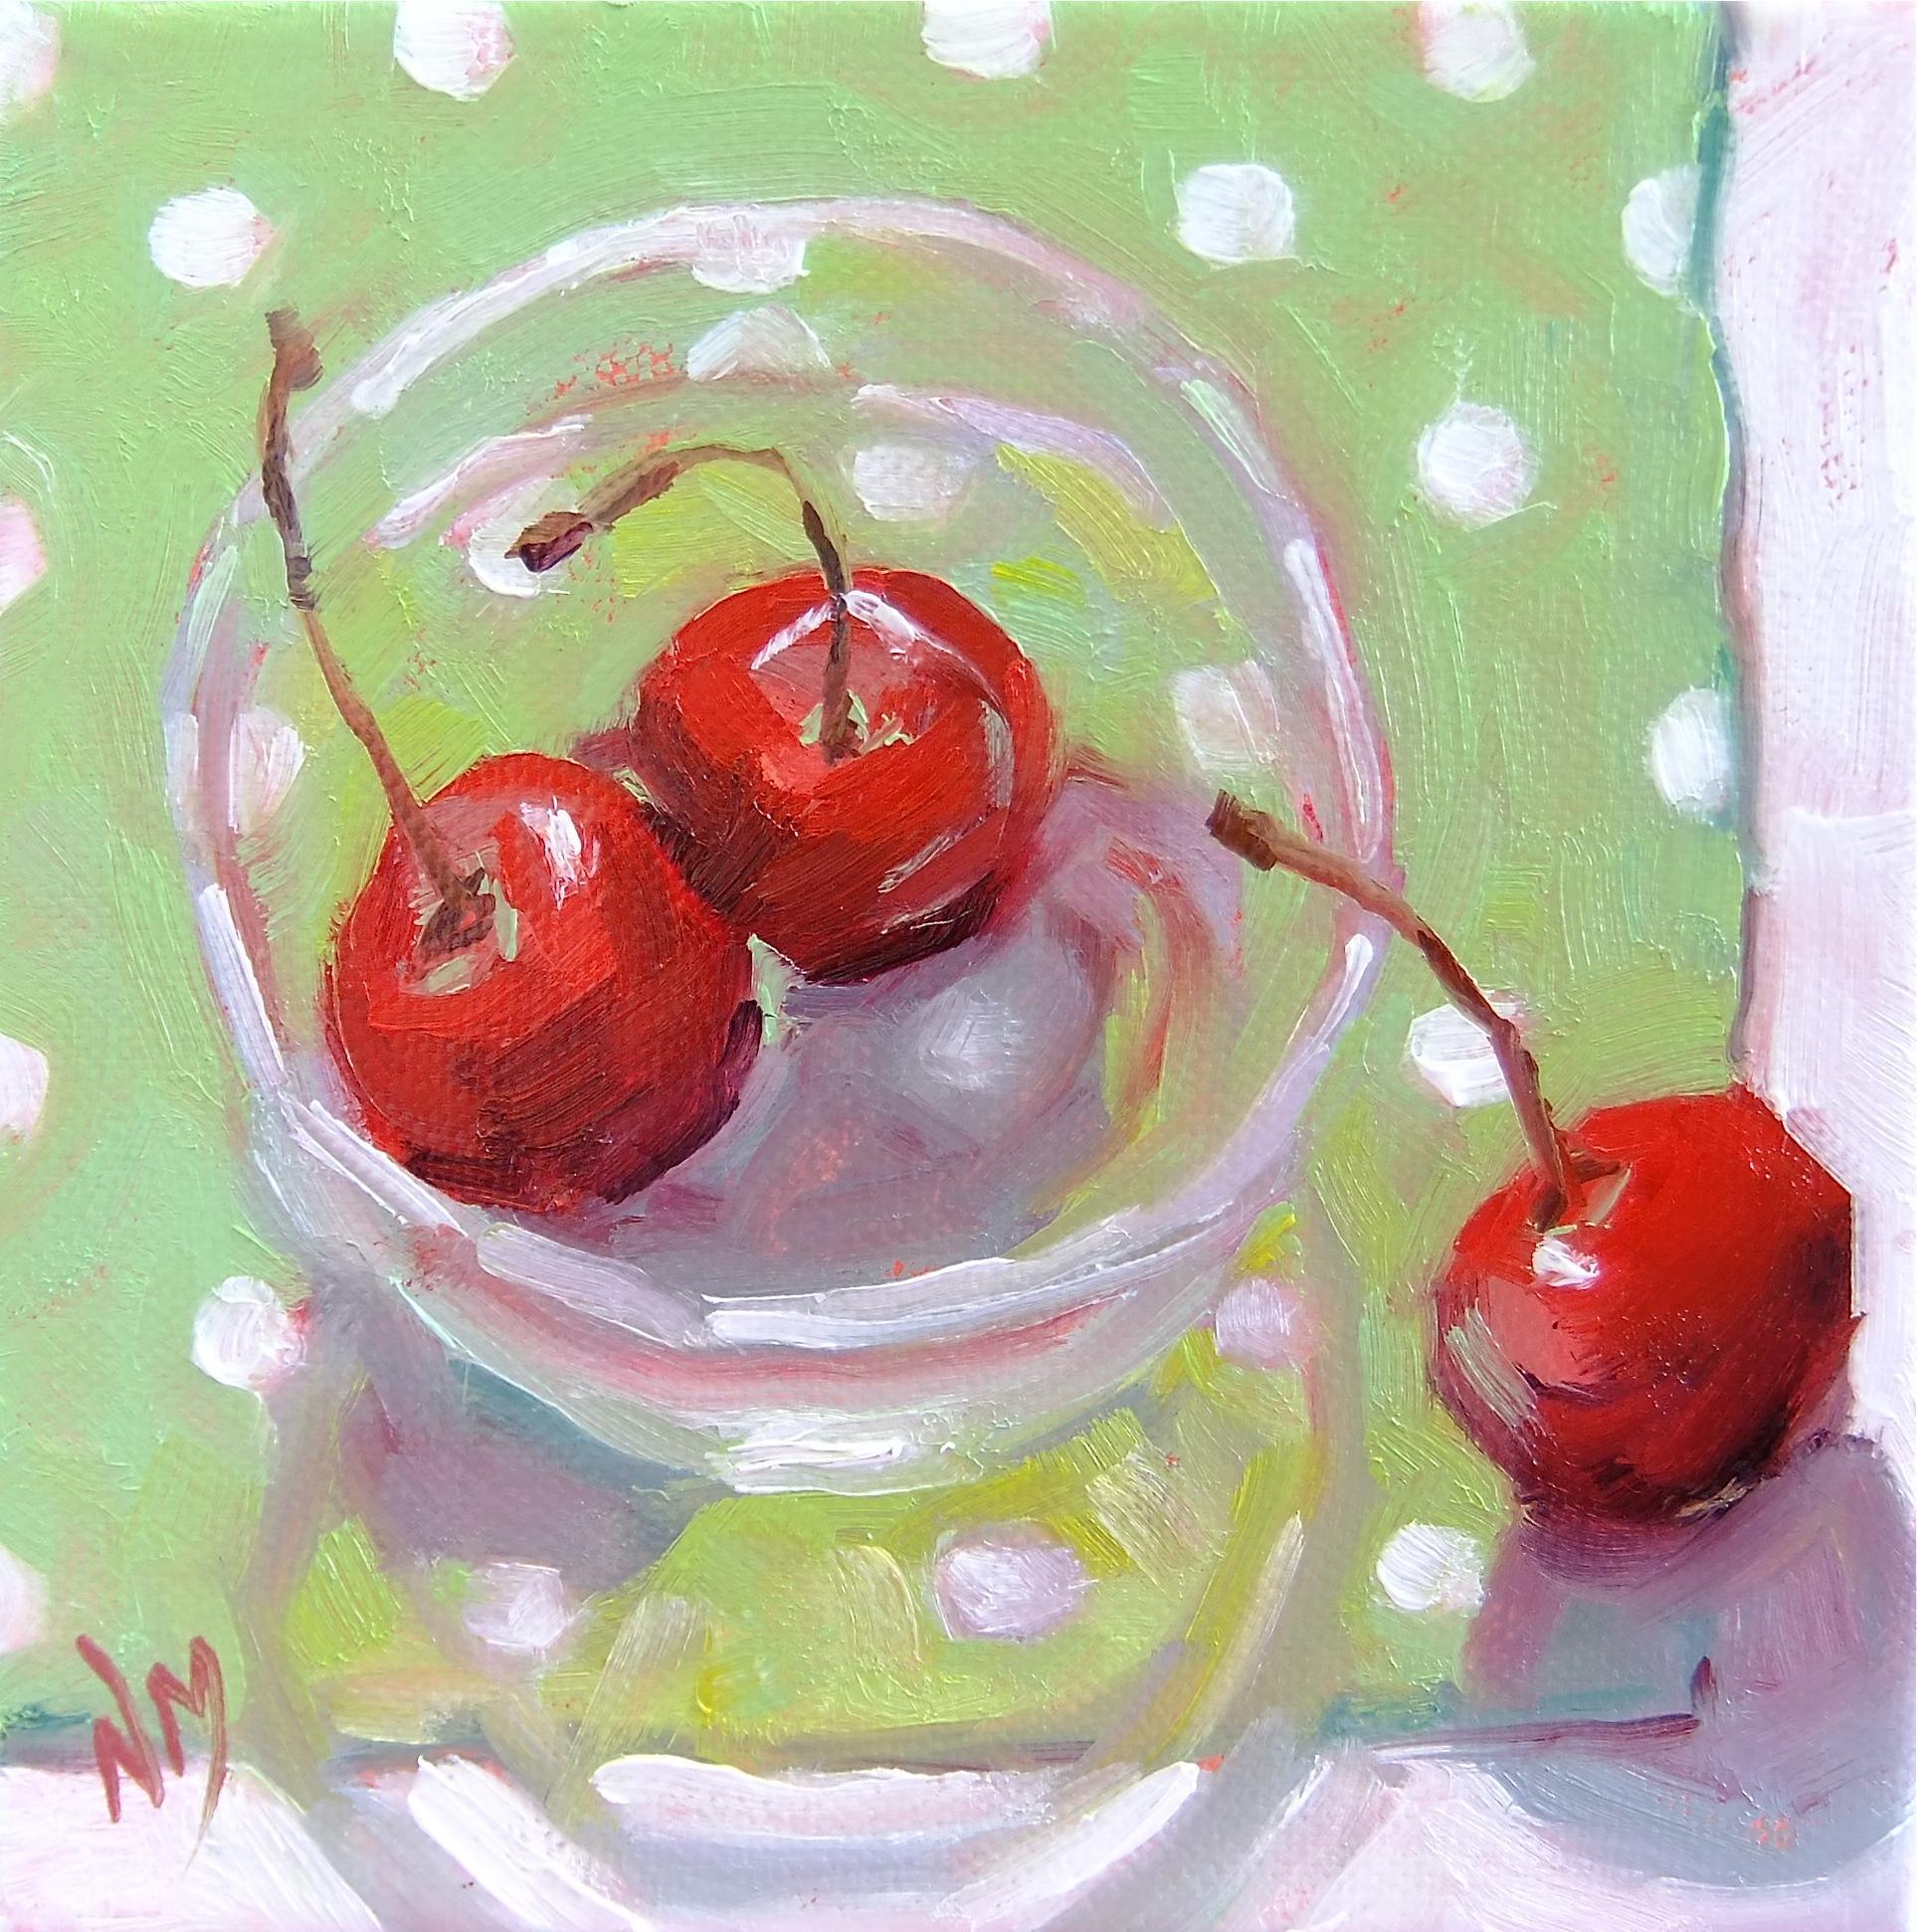 """Polka Dot Cherries"" original fine art by Nora MacPhail"